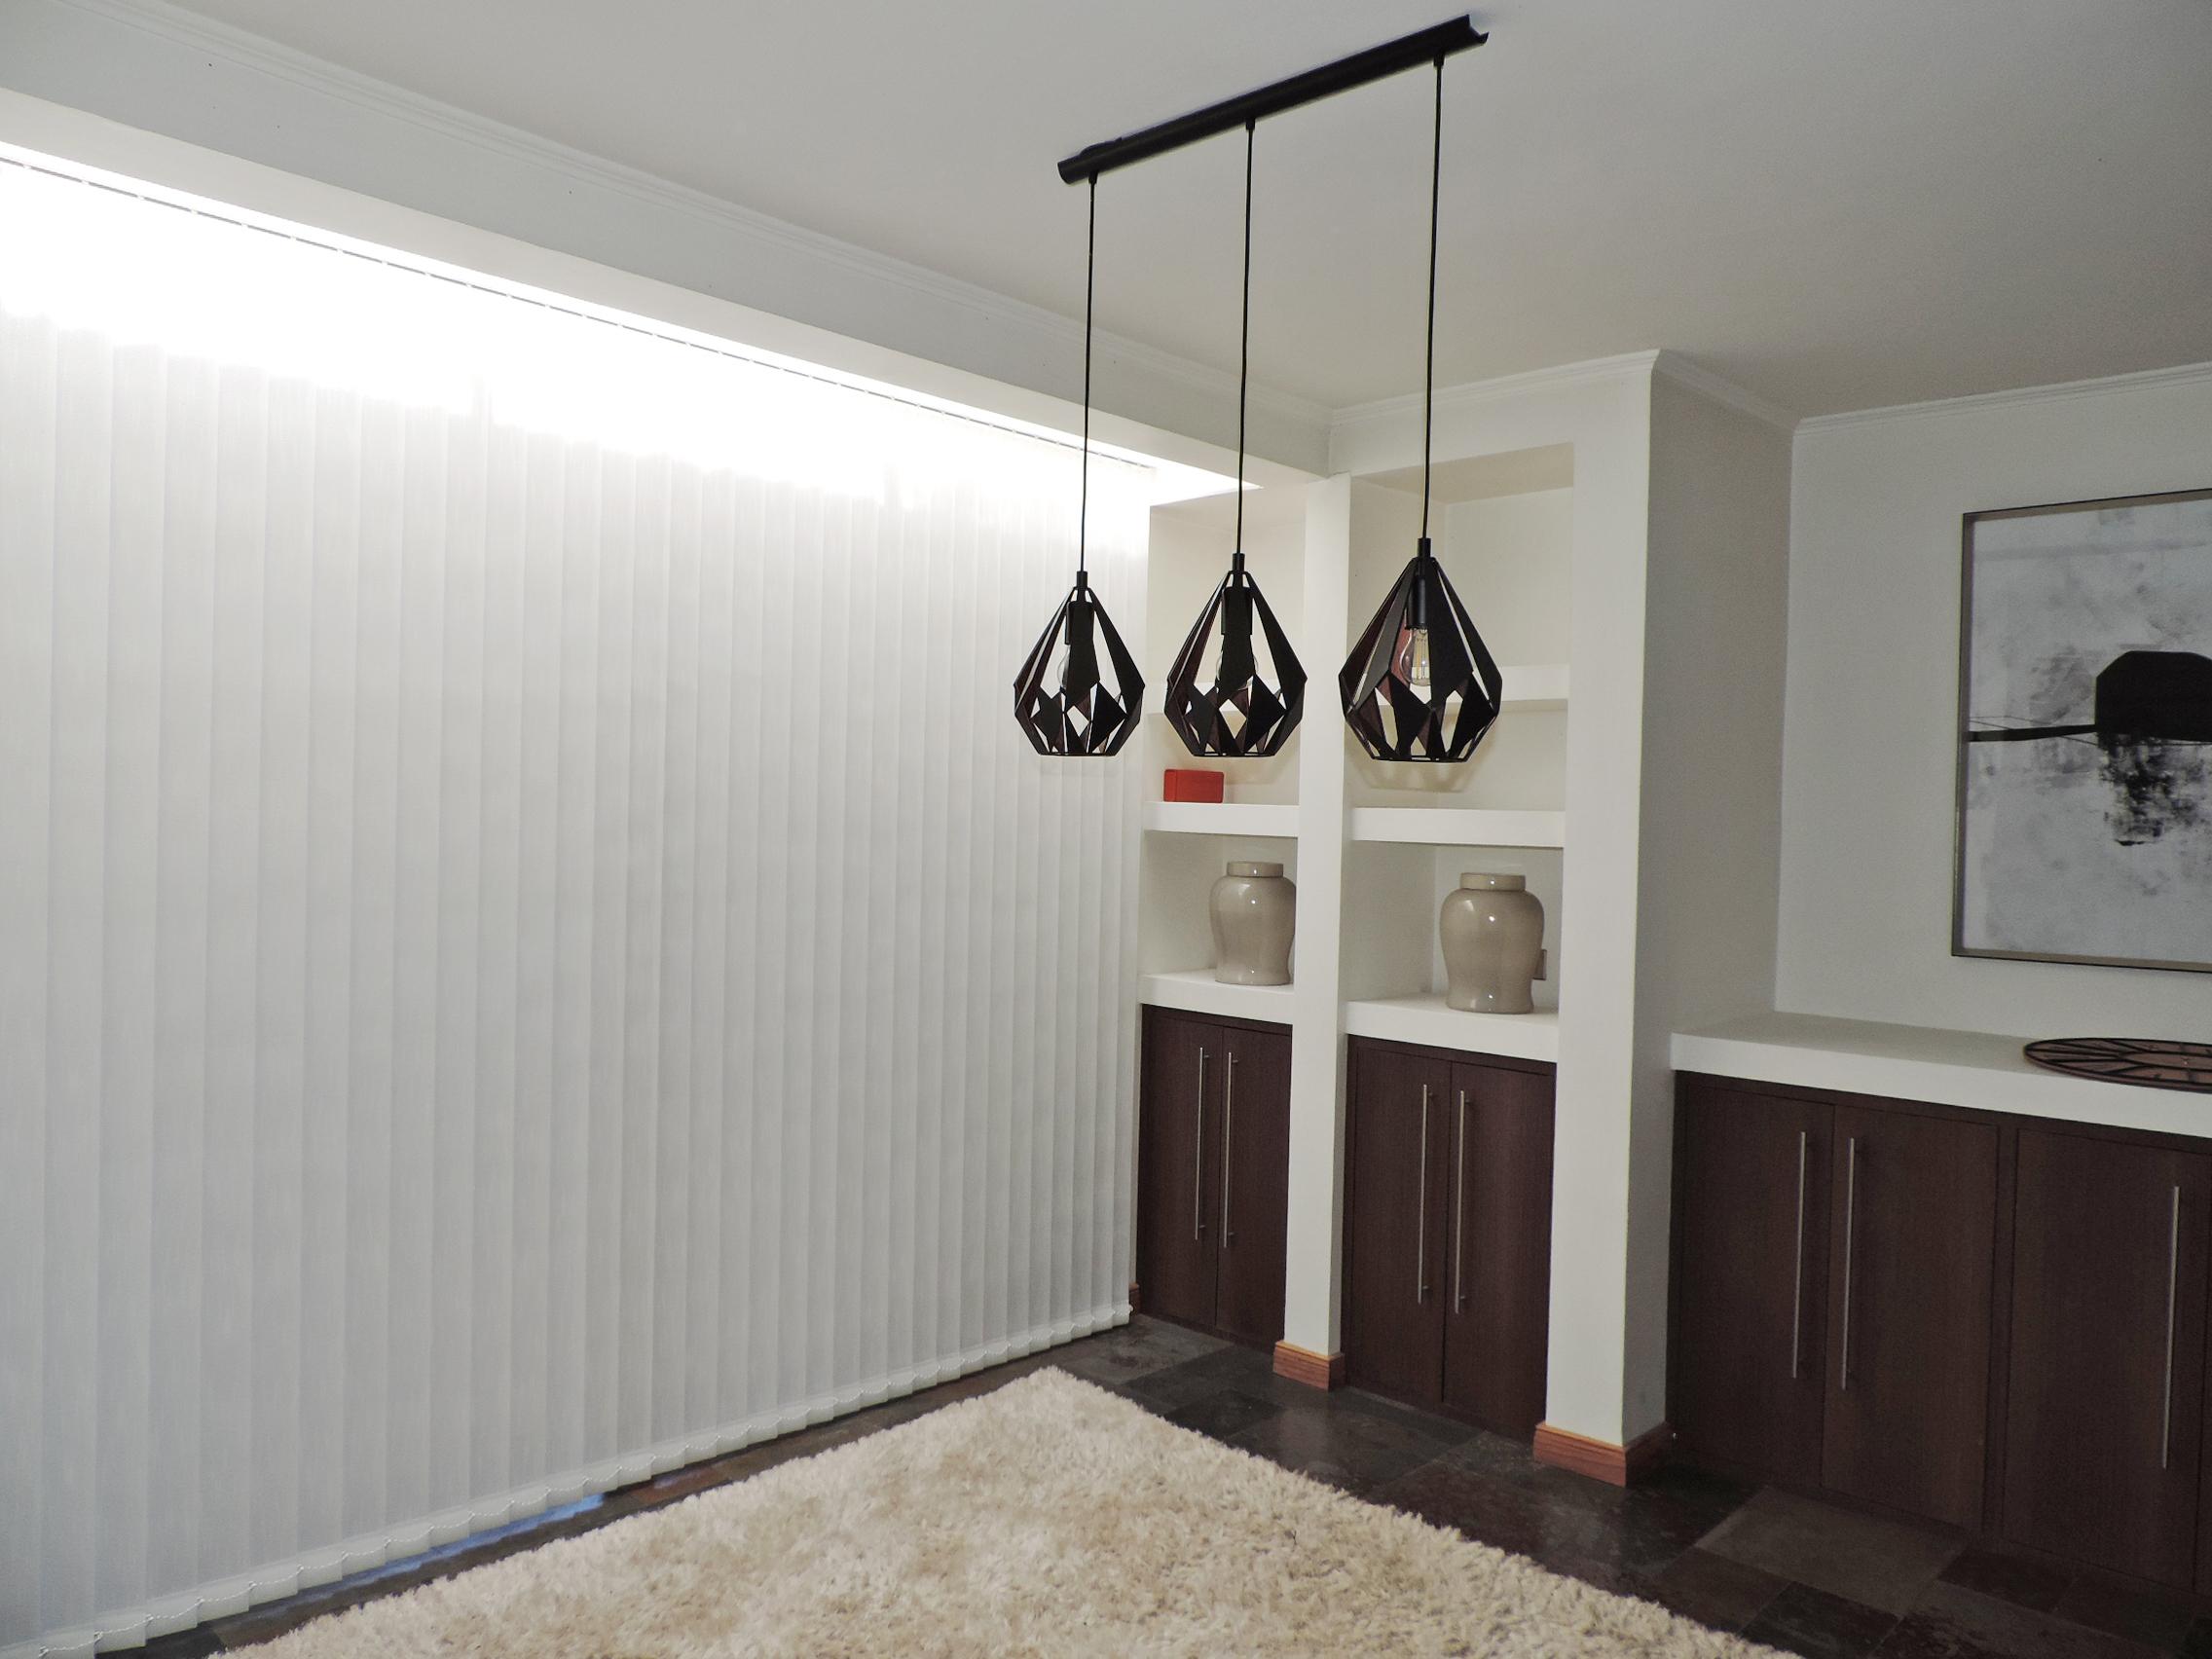 cortina vertical traslucida blanca textu